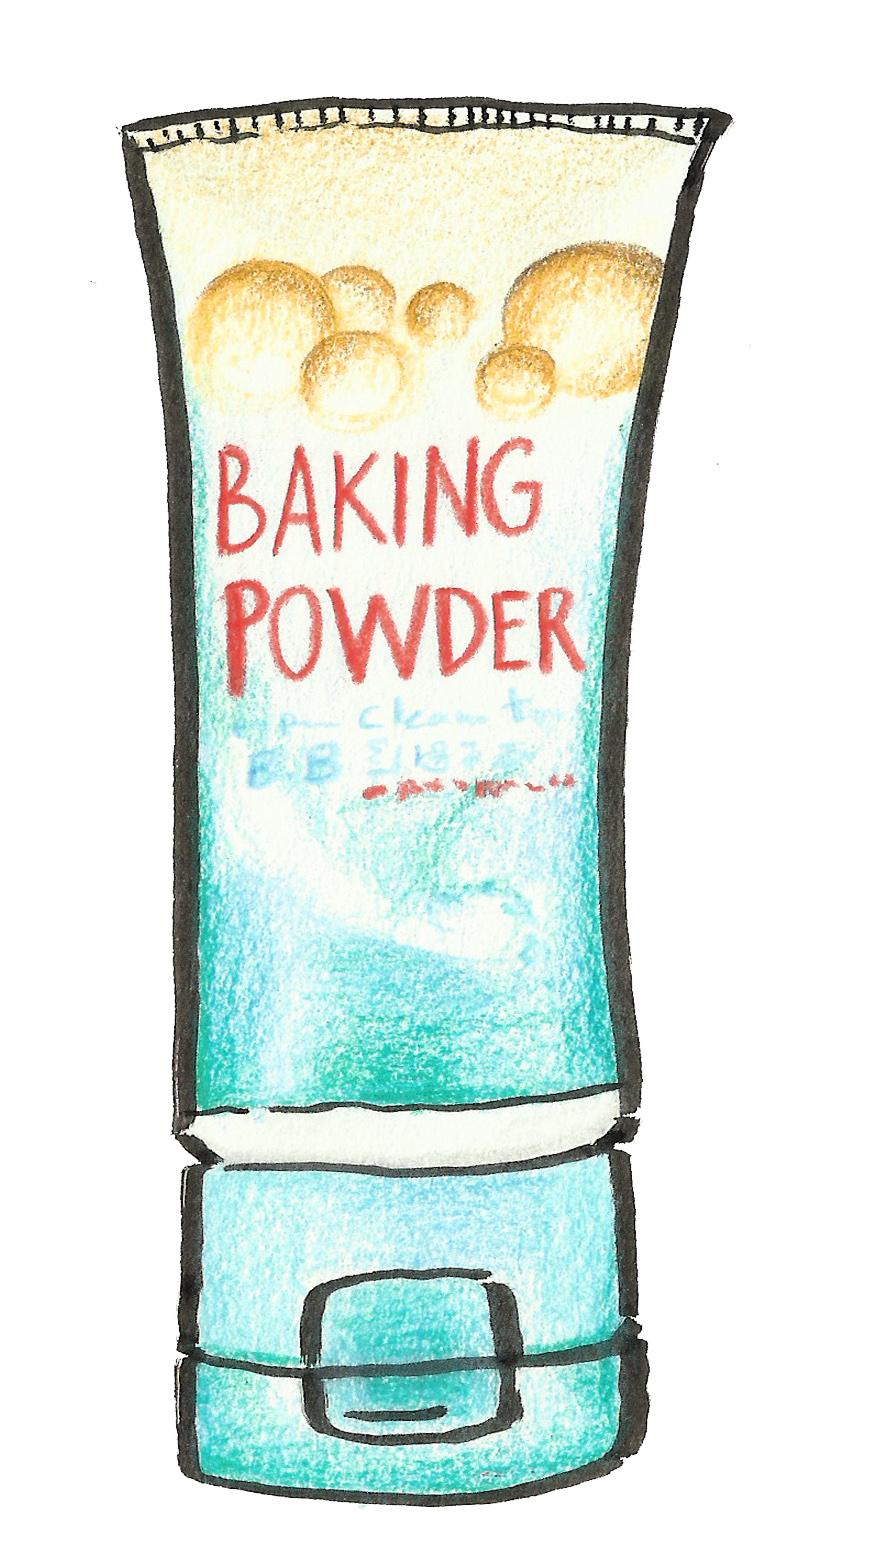 bakingpowder.jpg